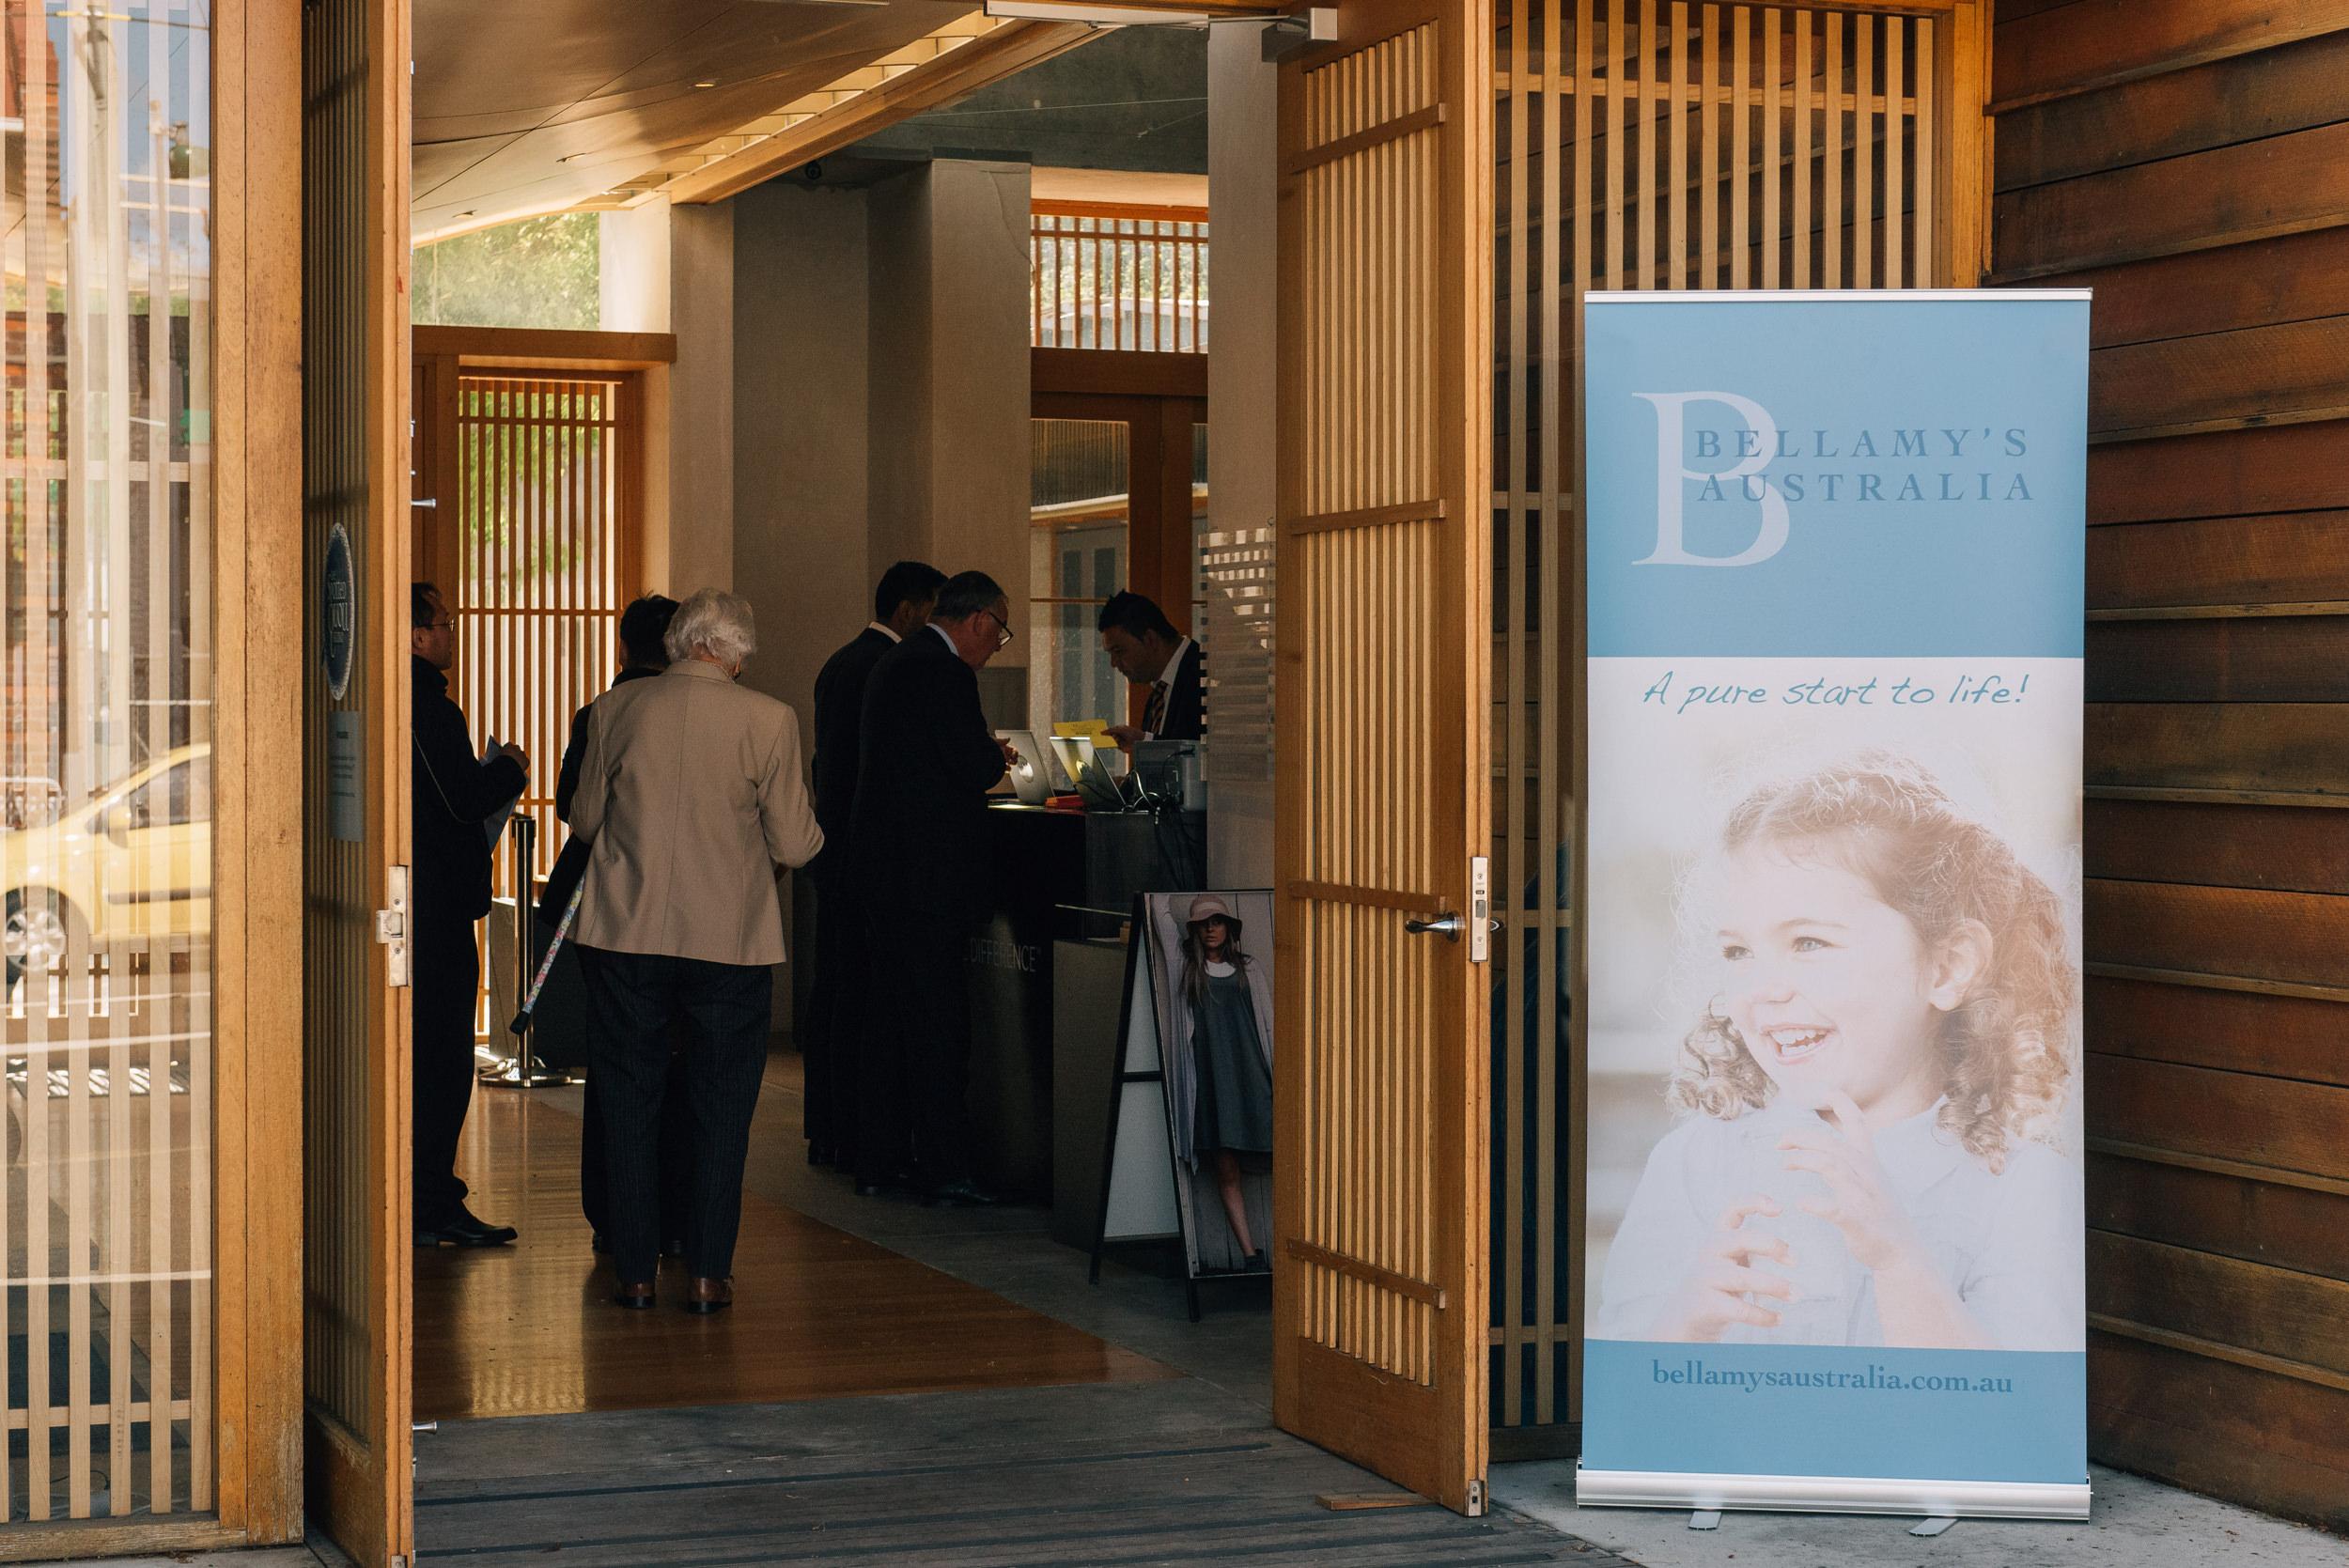 Bellamys-Corporate-Photography-Tasmania-4.jpg